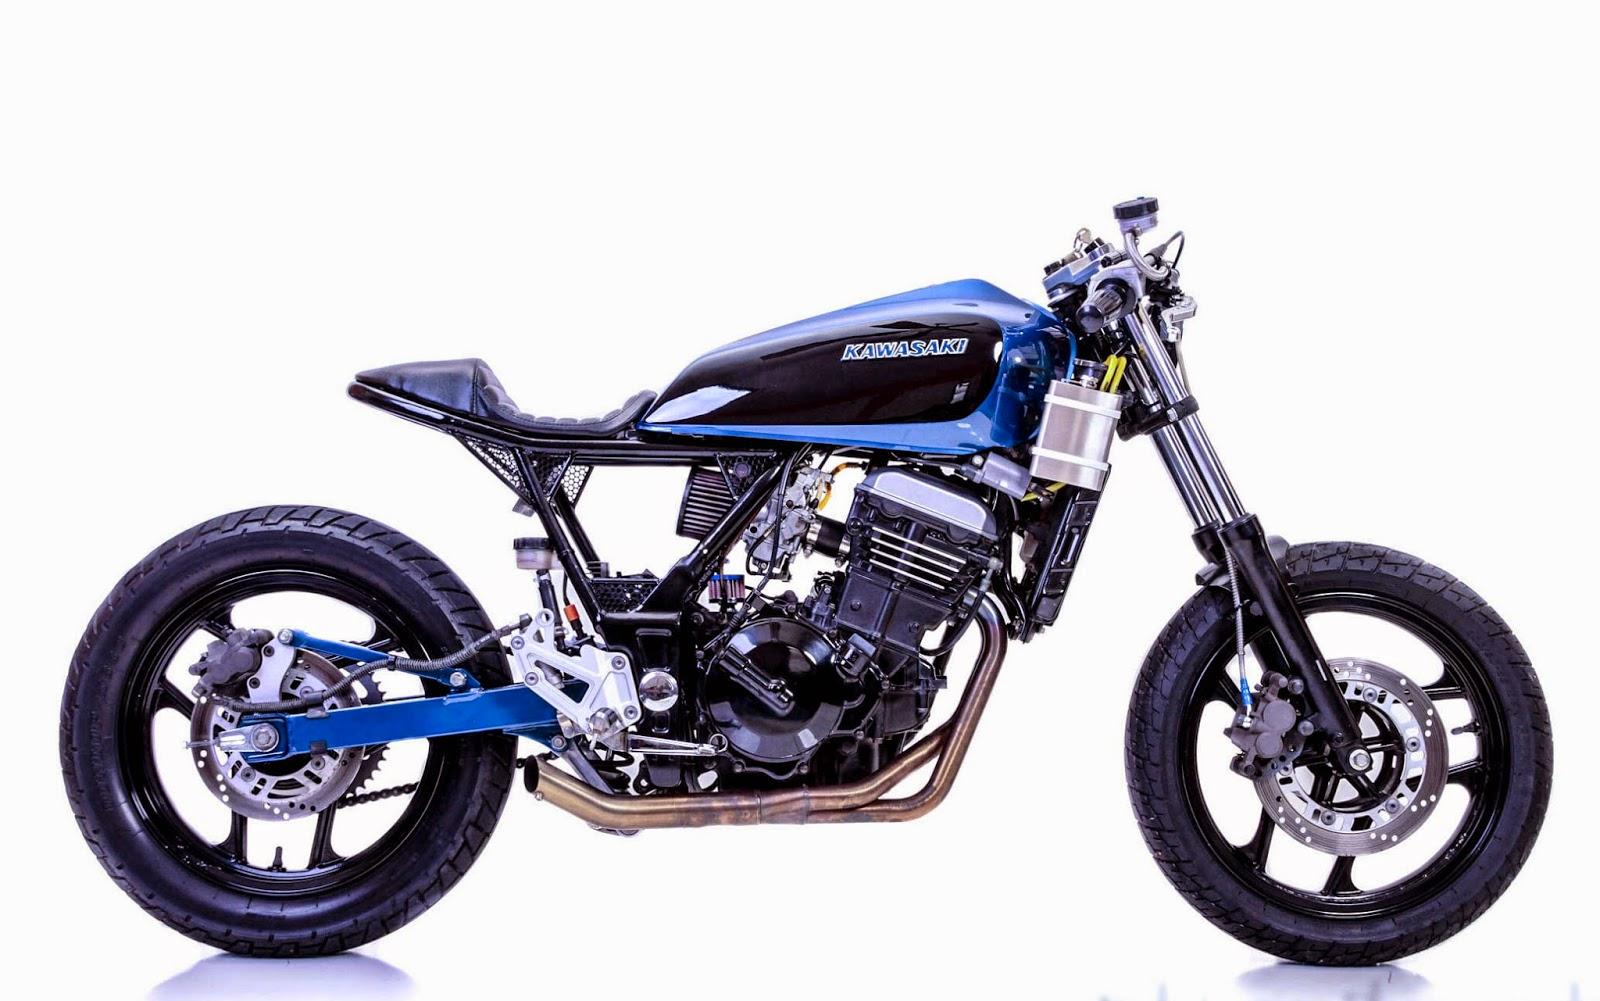 Kawasaki Ninja 250 2007 QuotMayonakaquot Midnight In Japanese From